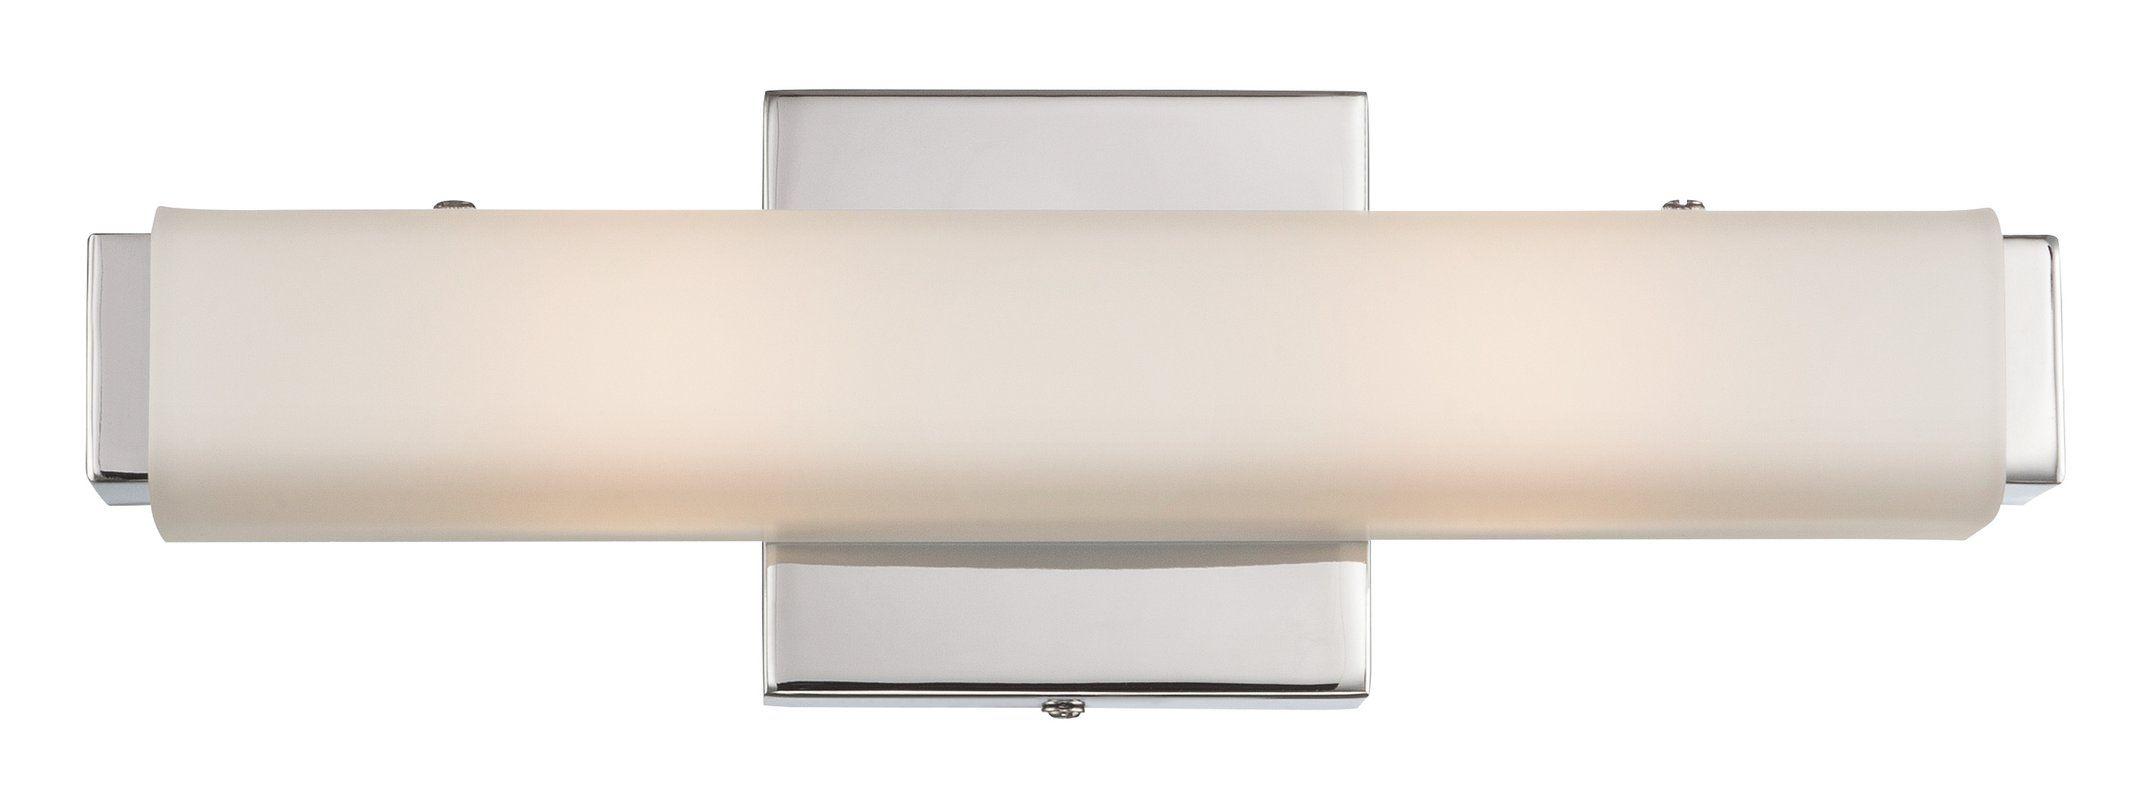 perin 2 light led bath bar 1035 m pinterest vanity lighting rh pinterest com